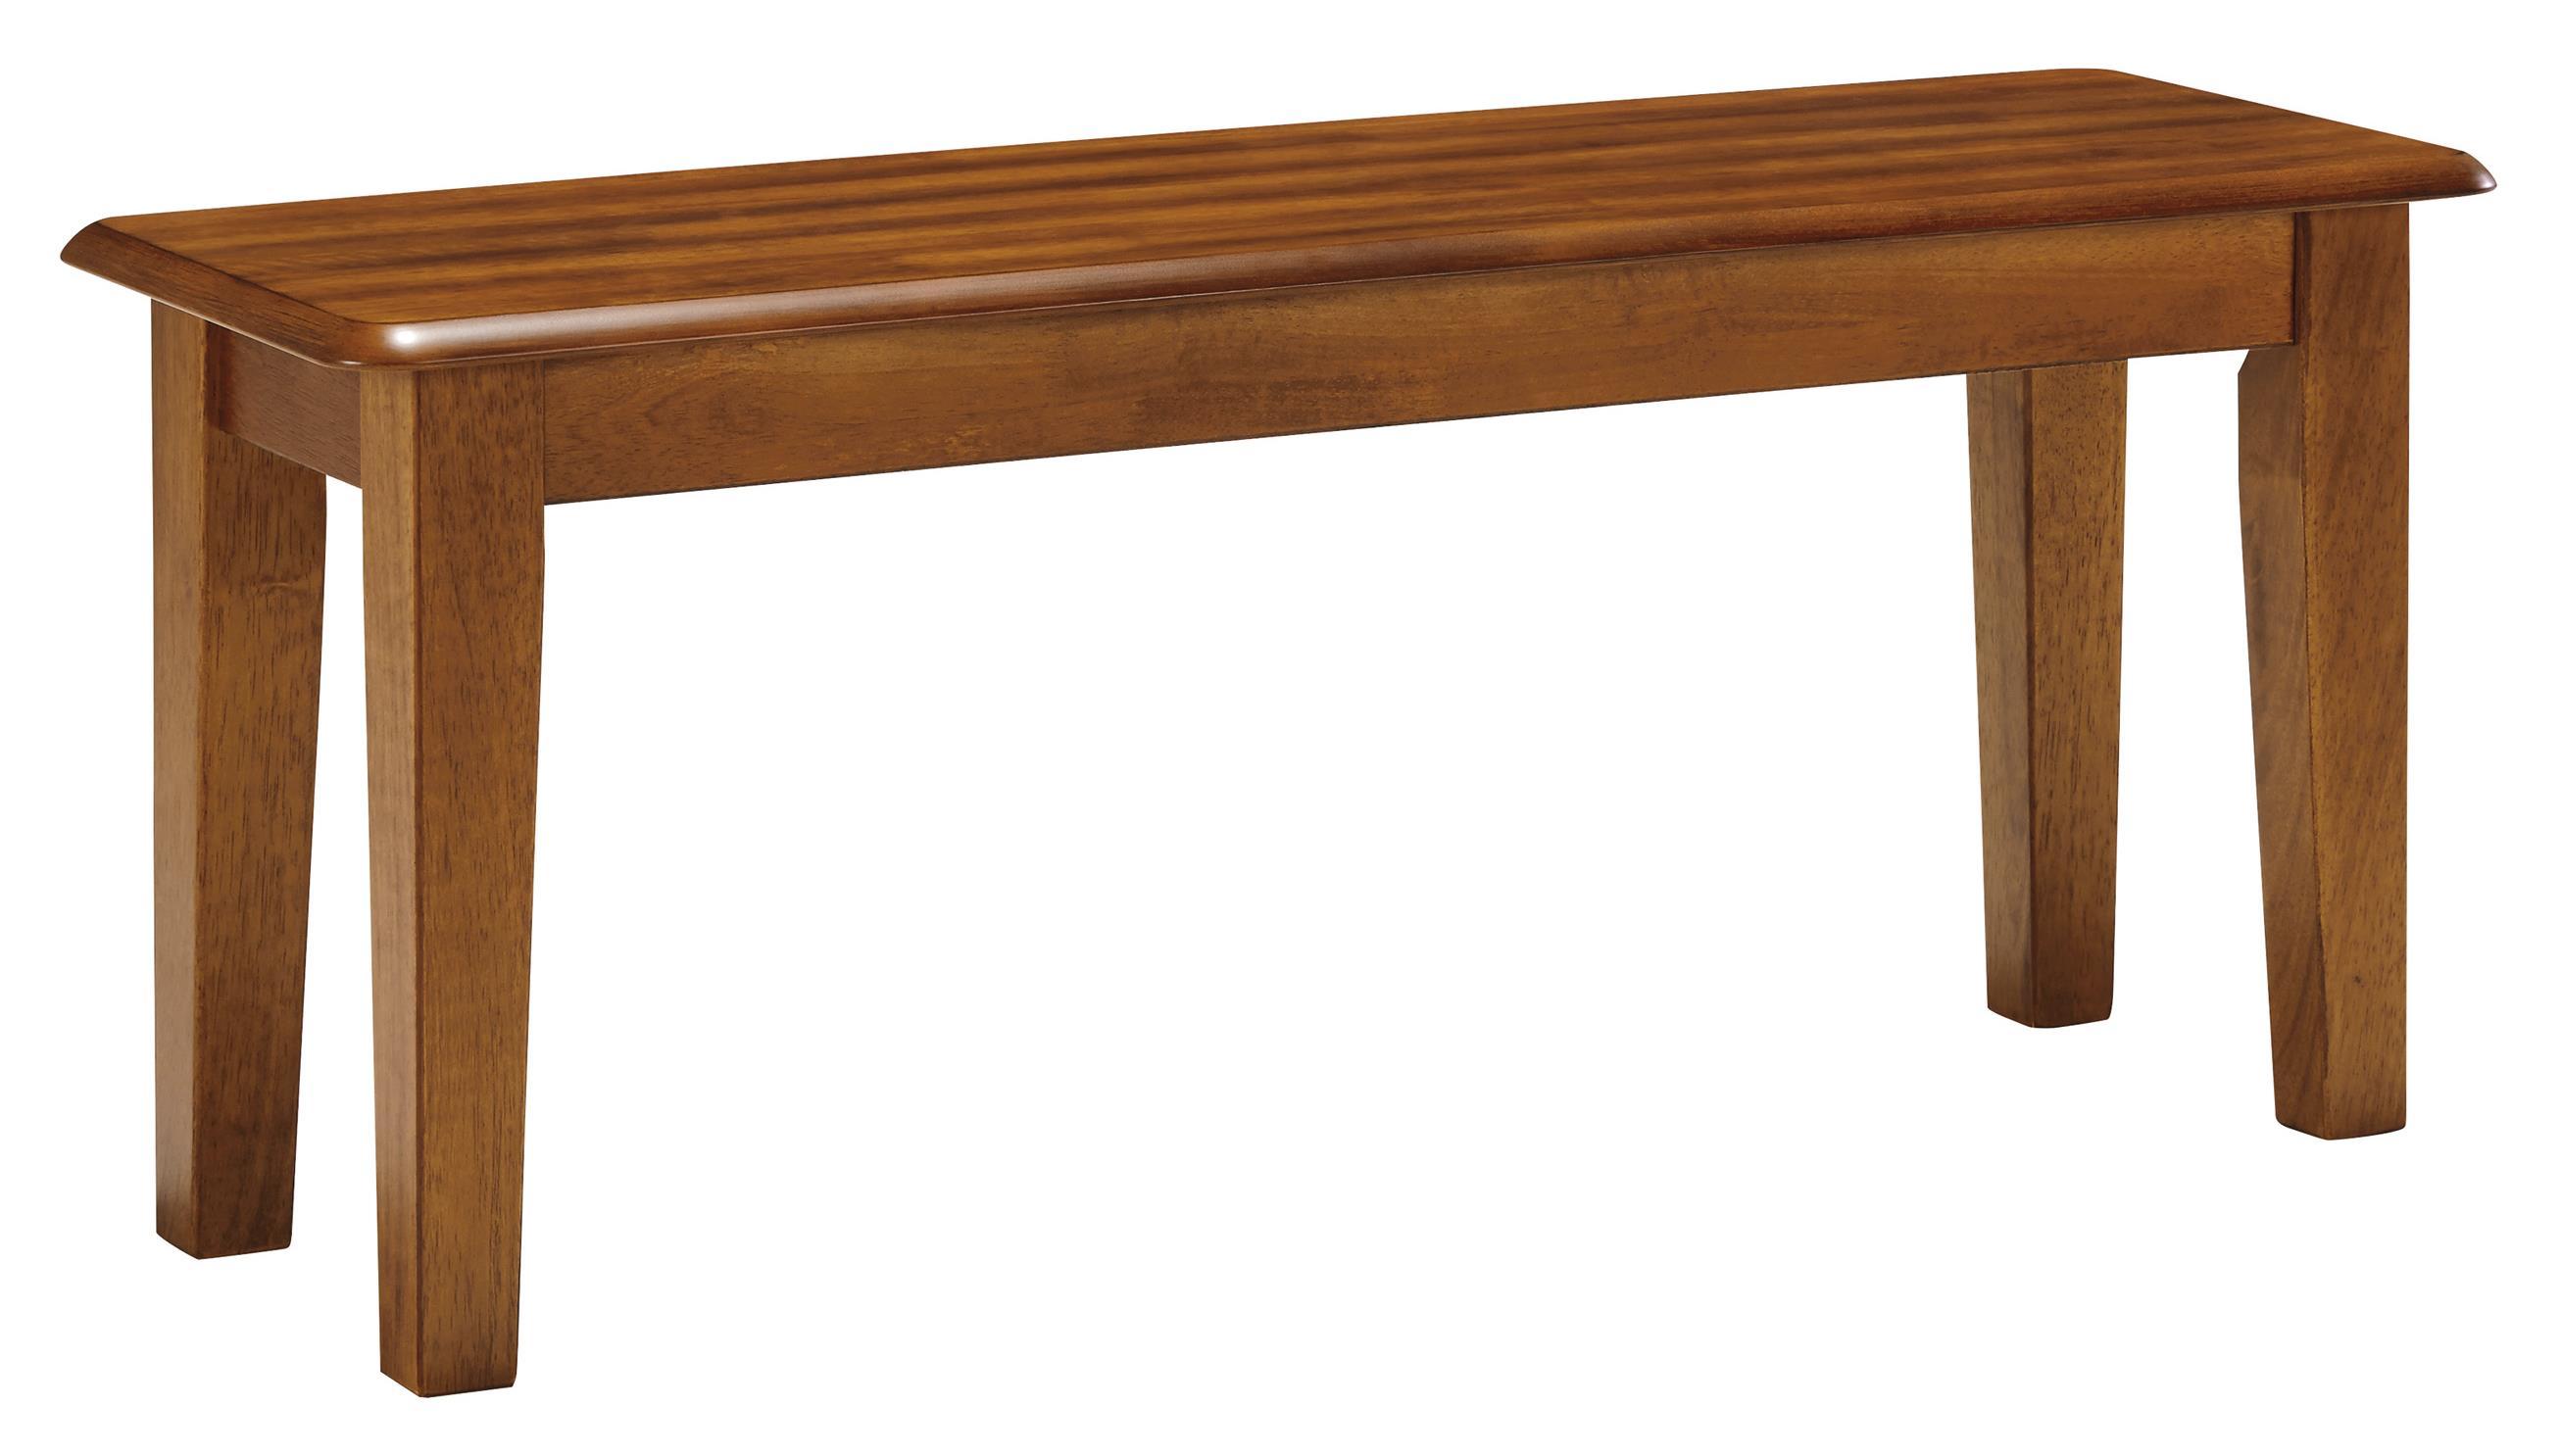 Berringer Bench by Ashley Furniture at Sparks HomeStore